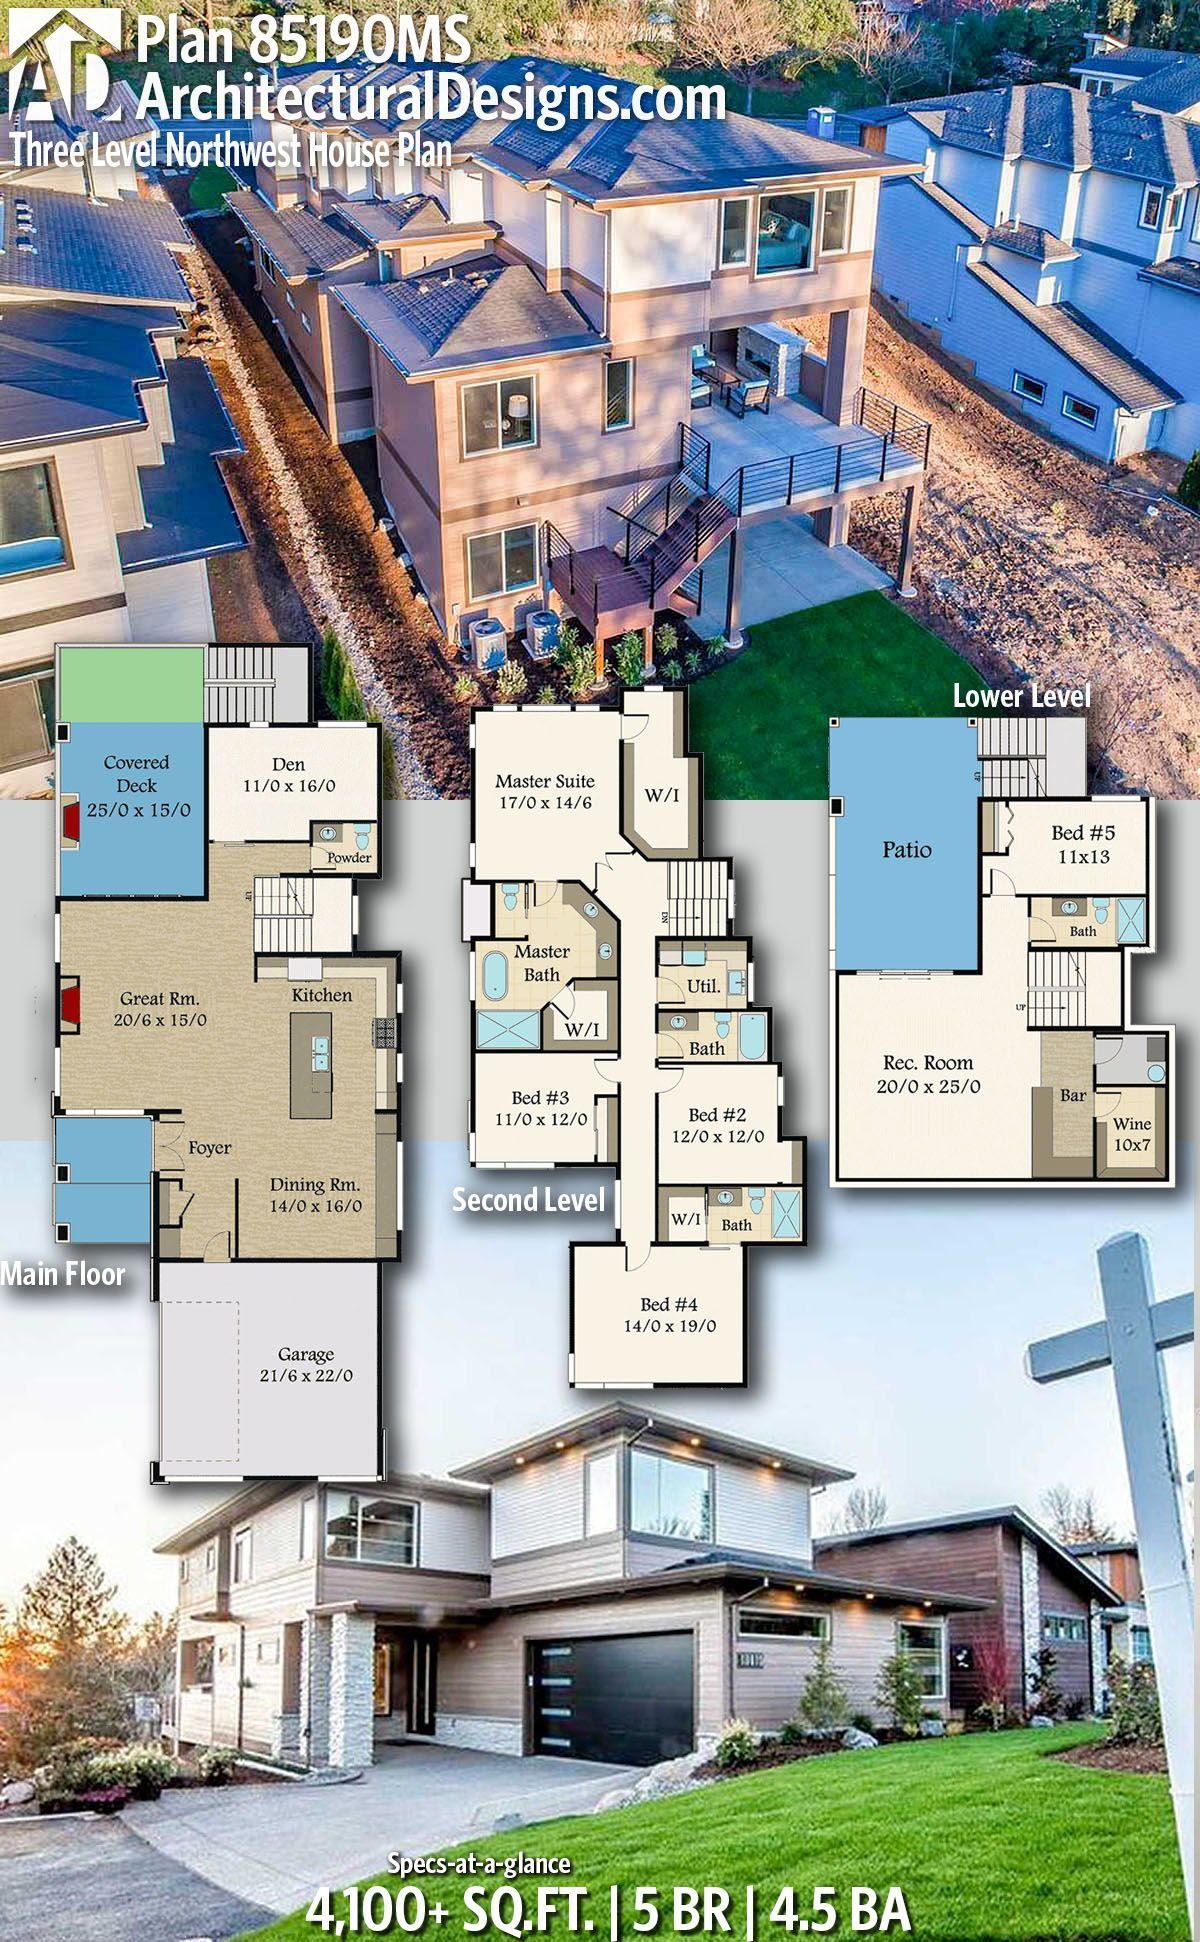 Plan 85190ms Three Level Northwest House Plan Architectural House Plans House Plans House Blueprints